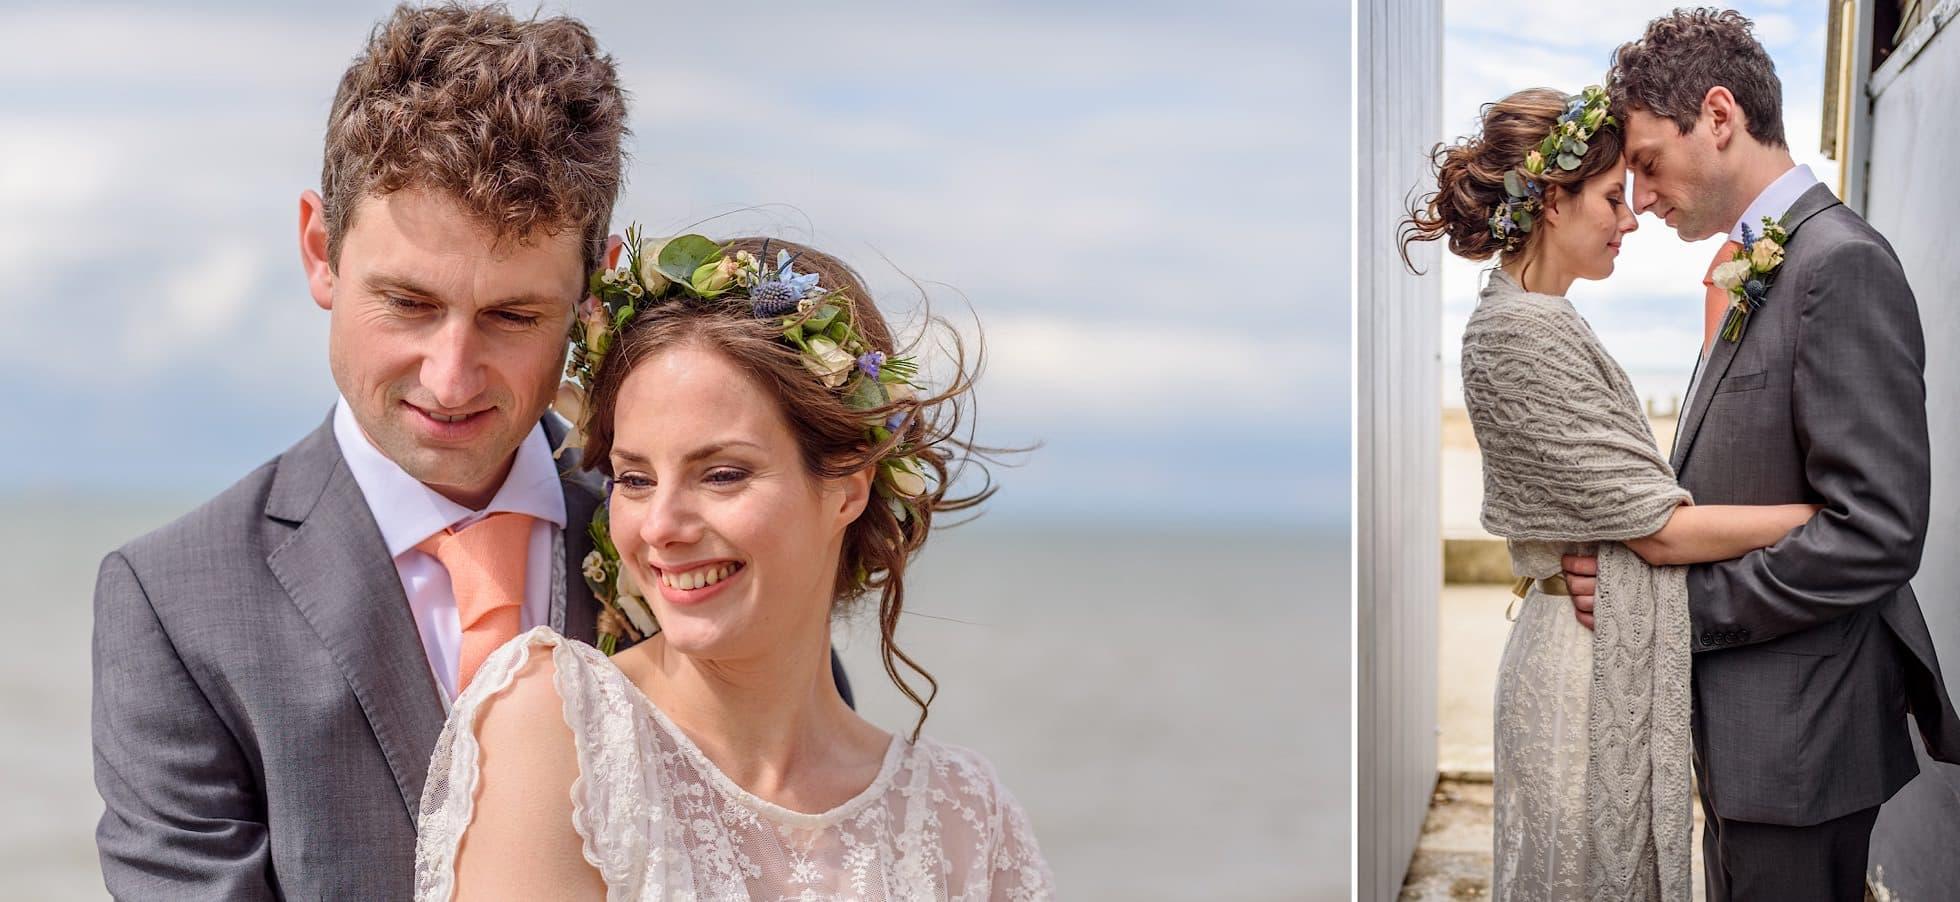 Wedding portraits on Whitstable beach